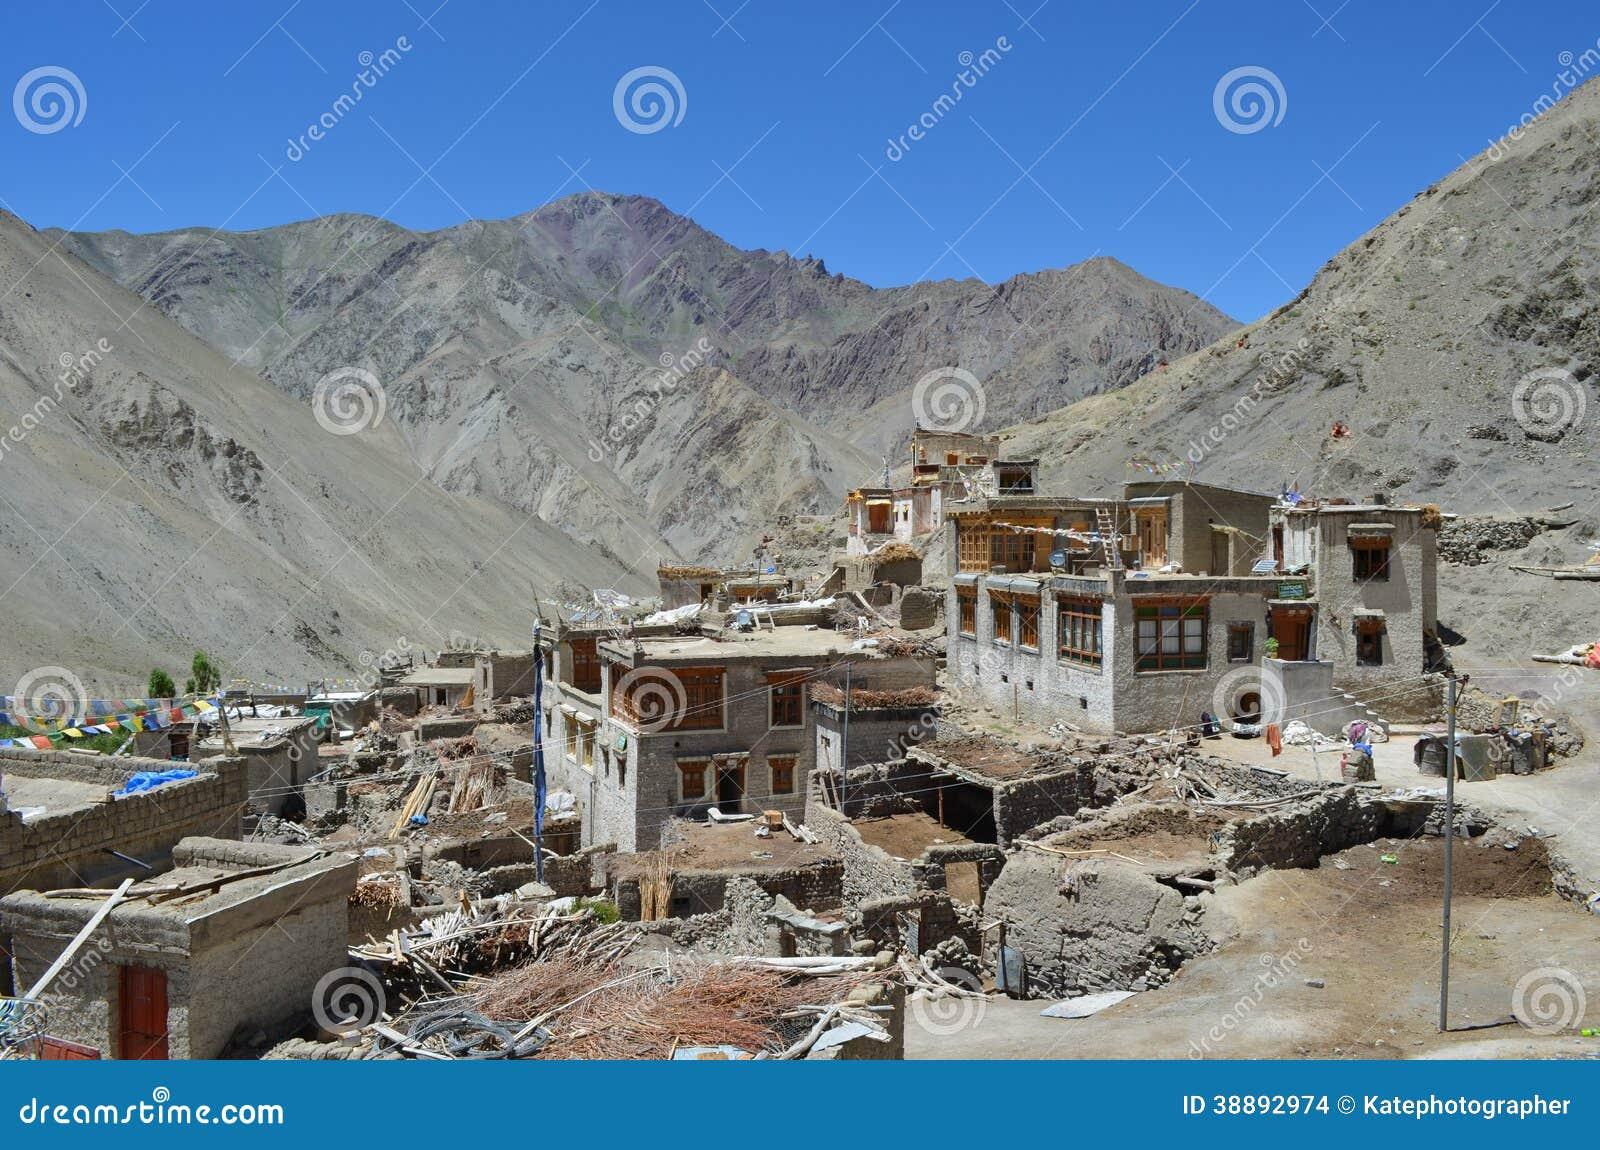 Tibetan Houses In Himalayas Range India Stock Photo